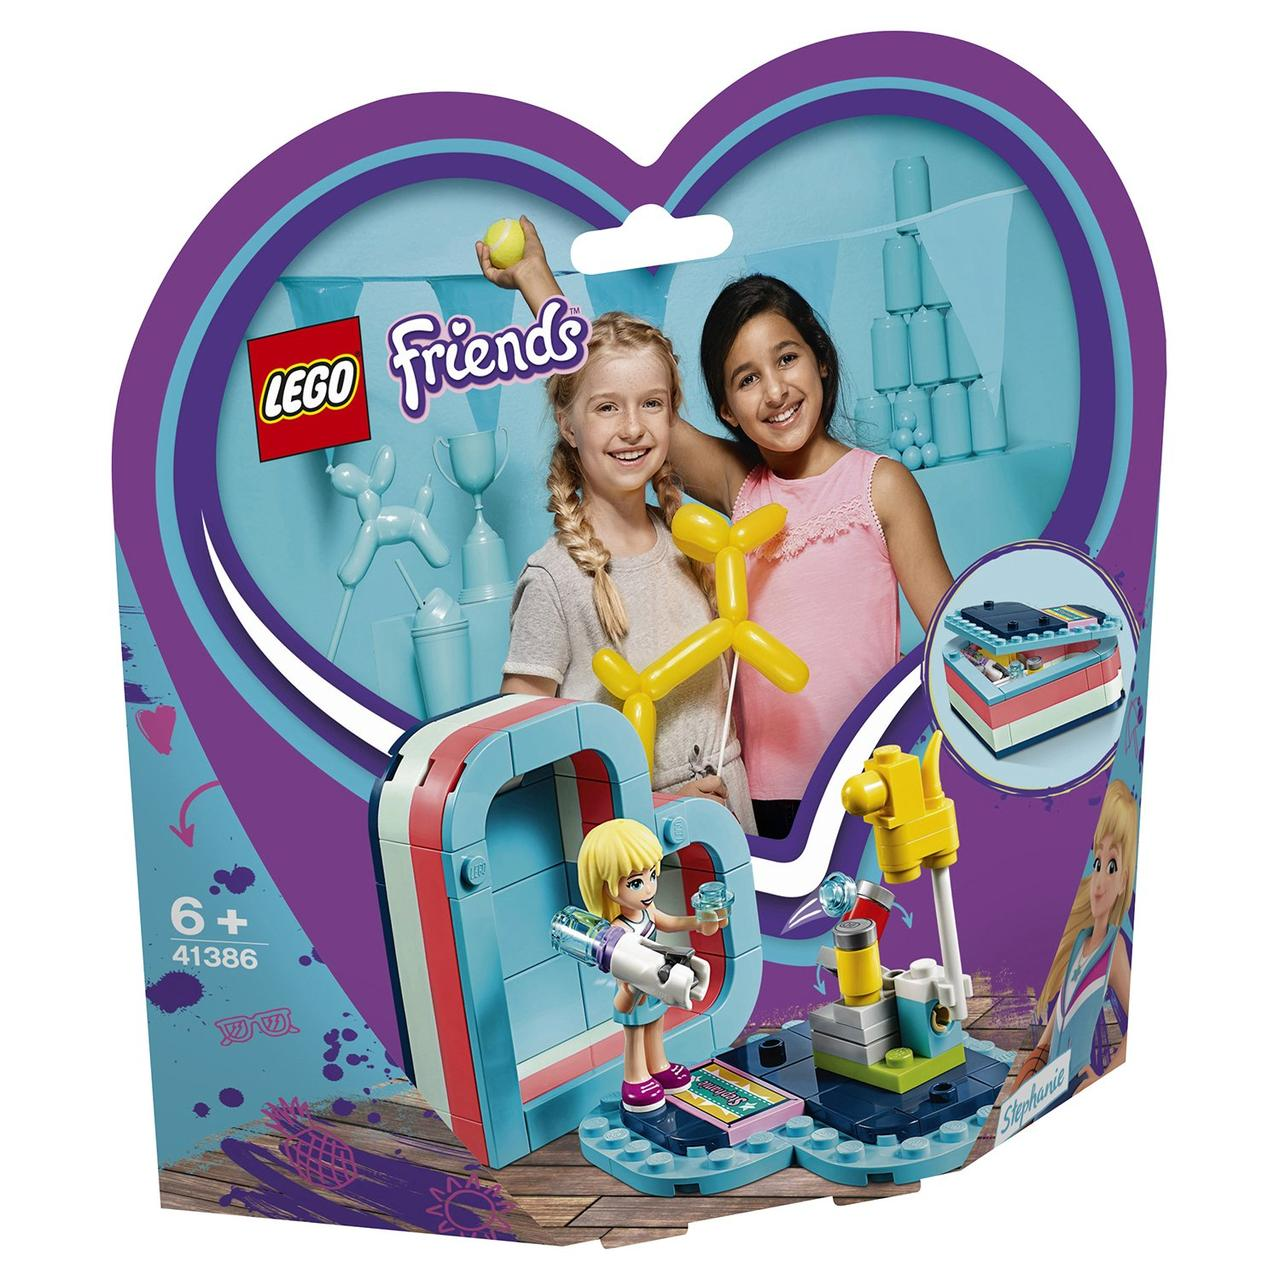 41386 Lego Friends Летняя шкатулка-сердечко для Стефани, Лего Подружки